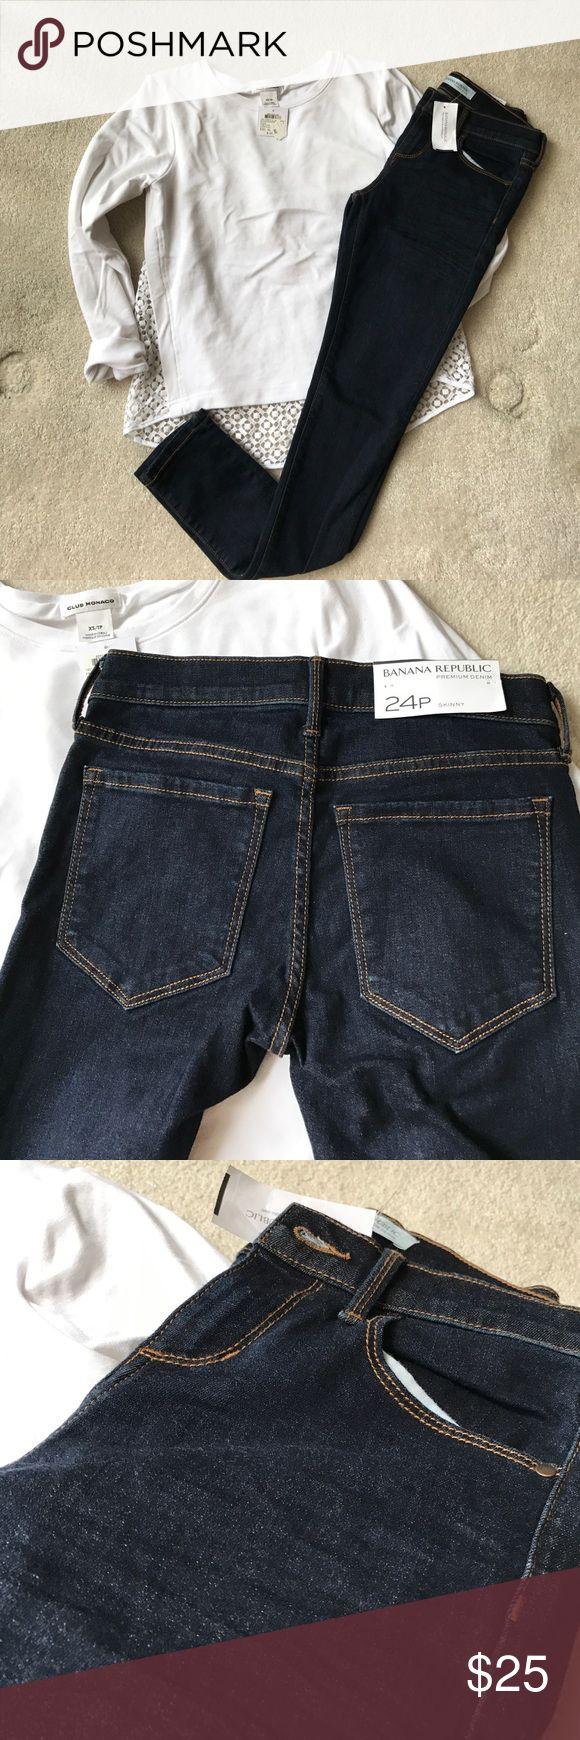 Banana Republic Skinny Jeans Dark Blue Petite Skinny Jeans Banana Republic Jeans Skinny